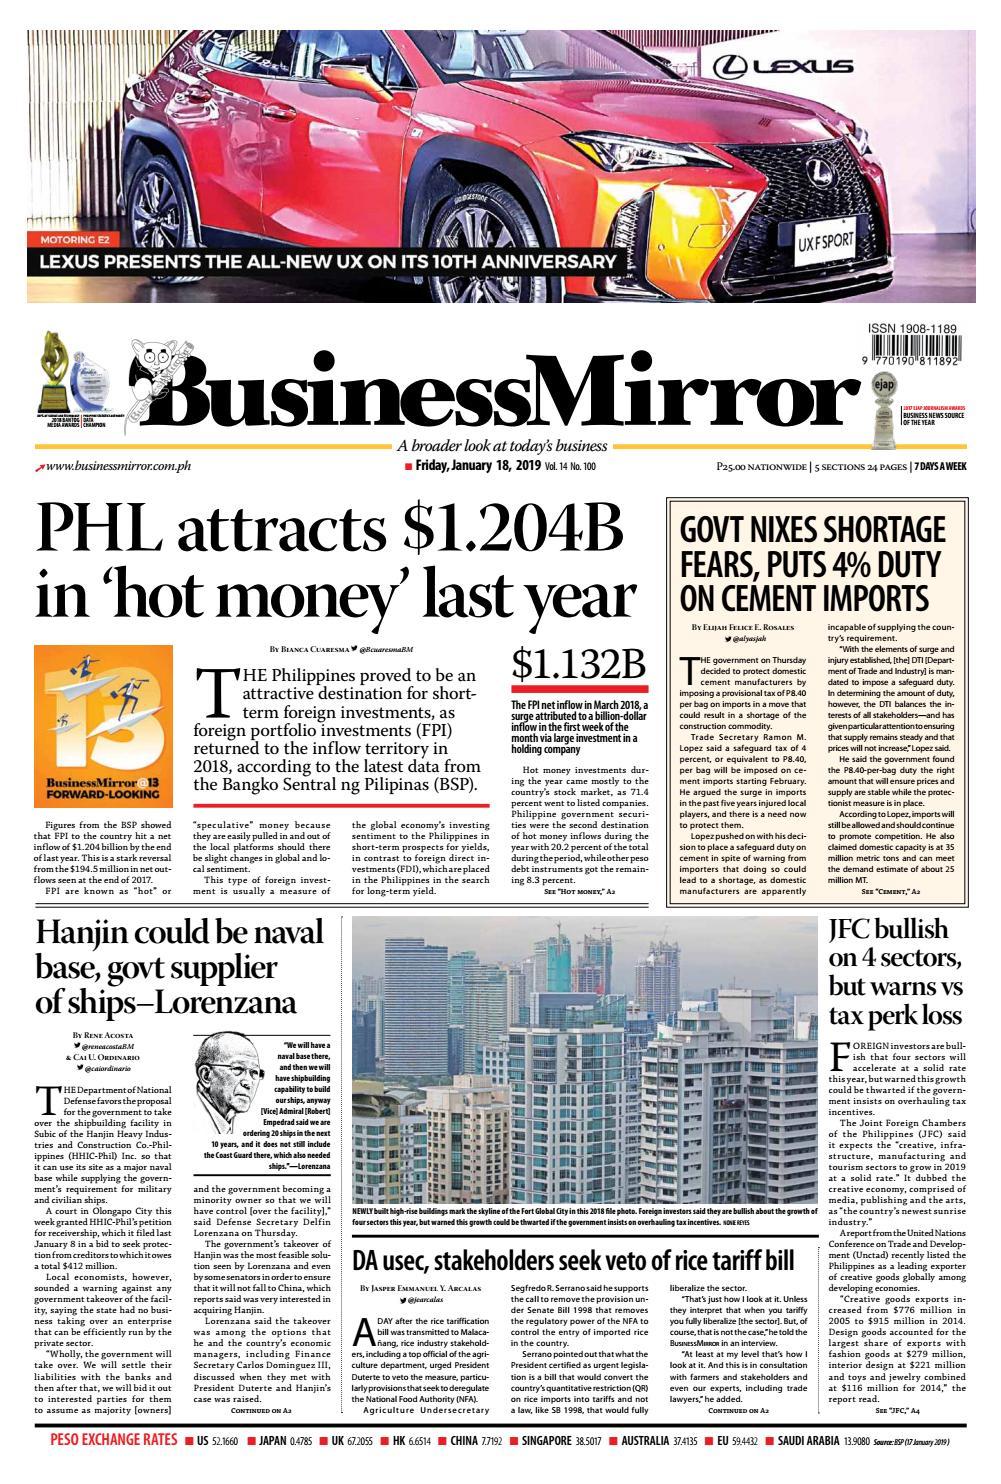 Businessmirror January 18, 2019 by BusinessMirror - issuu